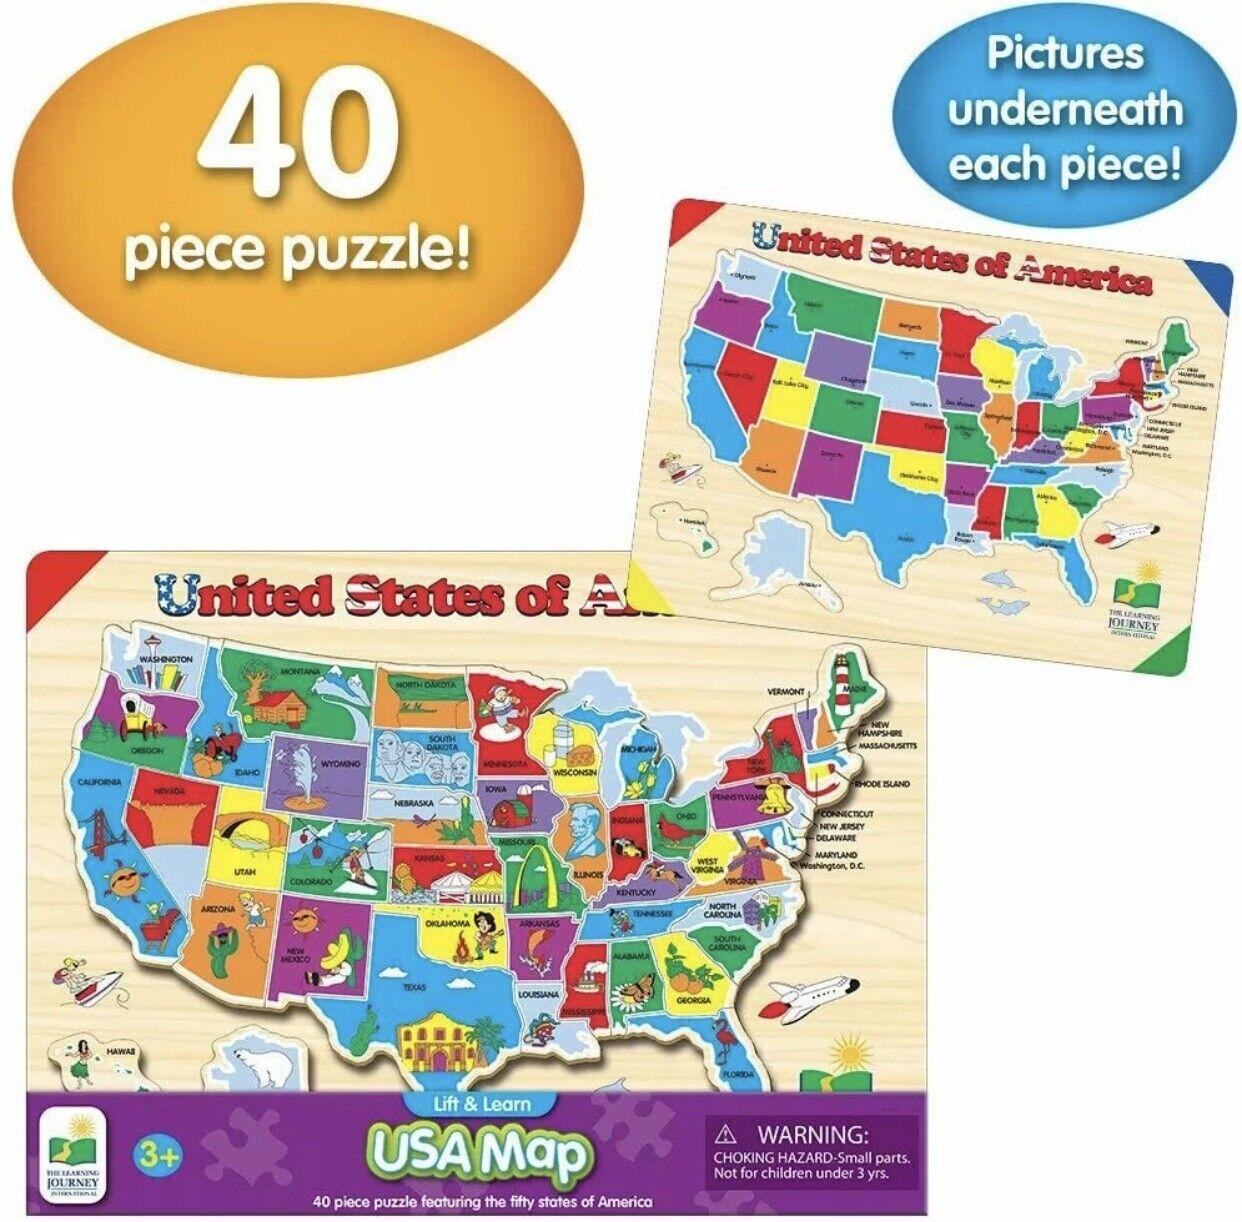 Encyclopedia Britannica Talking Us Map Puzzle Learning Aid TEK Nek Toys Encyclopedia Britannica Talking USA Map Puzzle